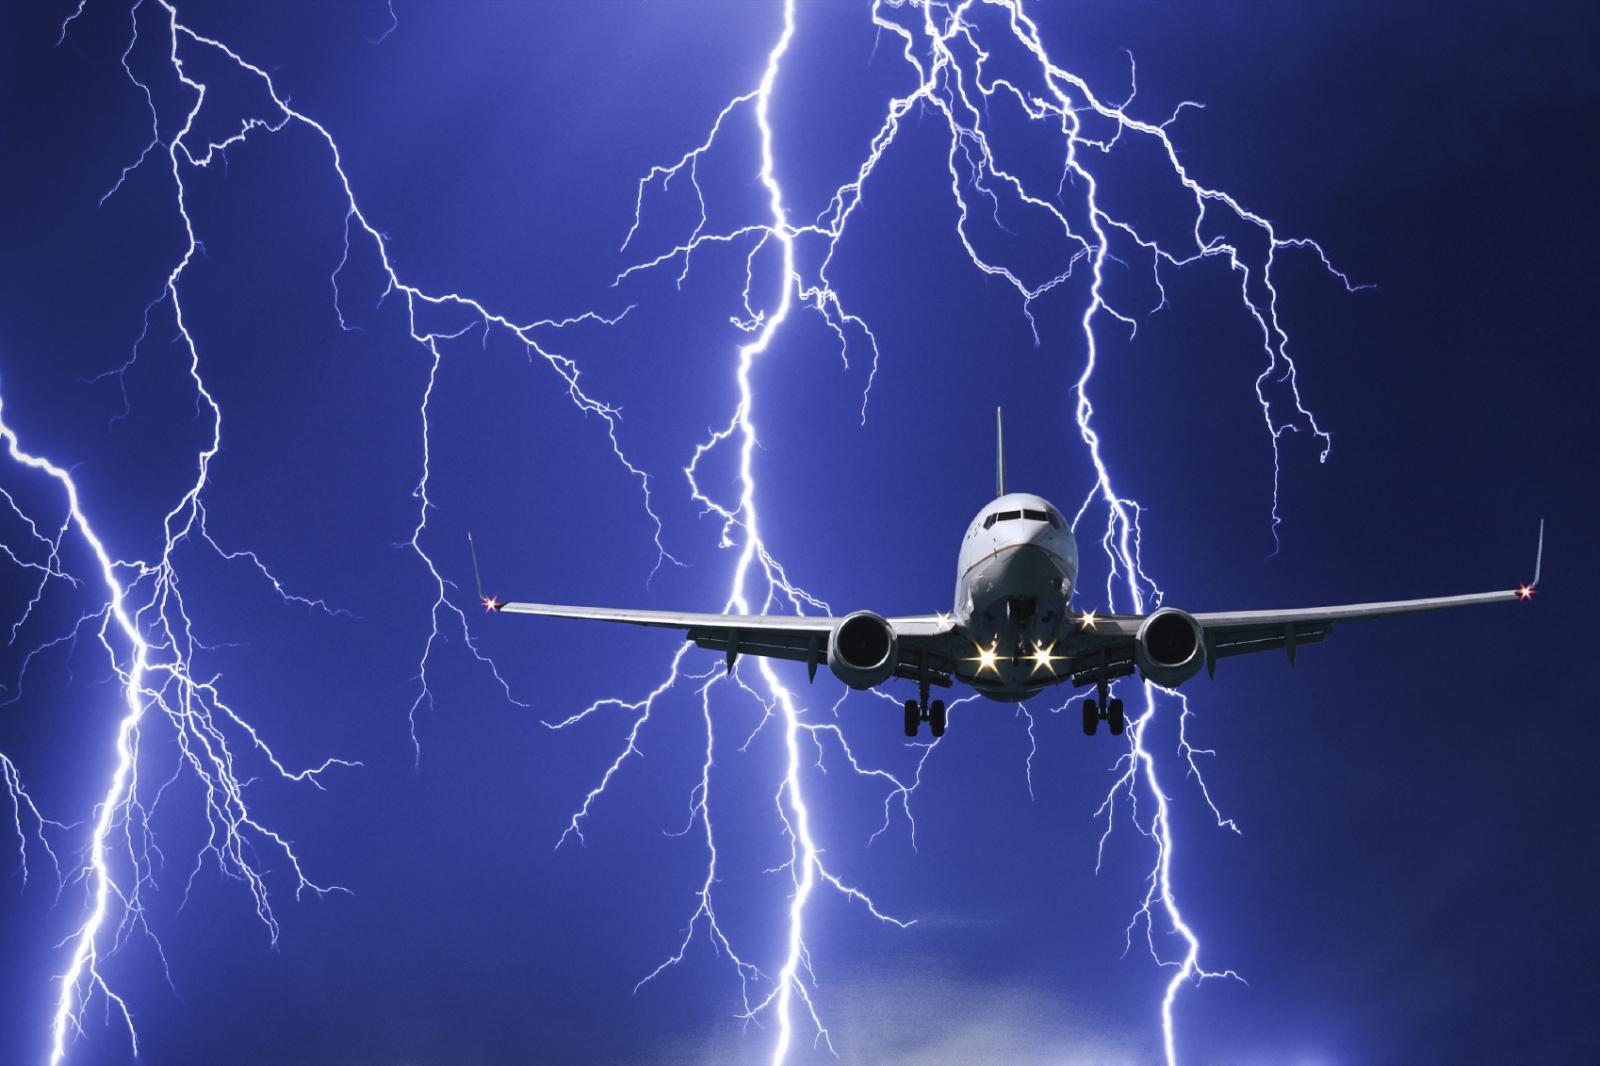 plane in lightning